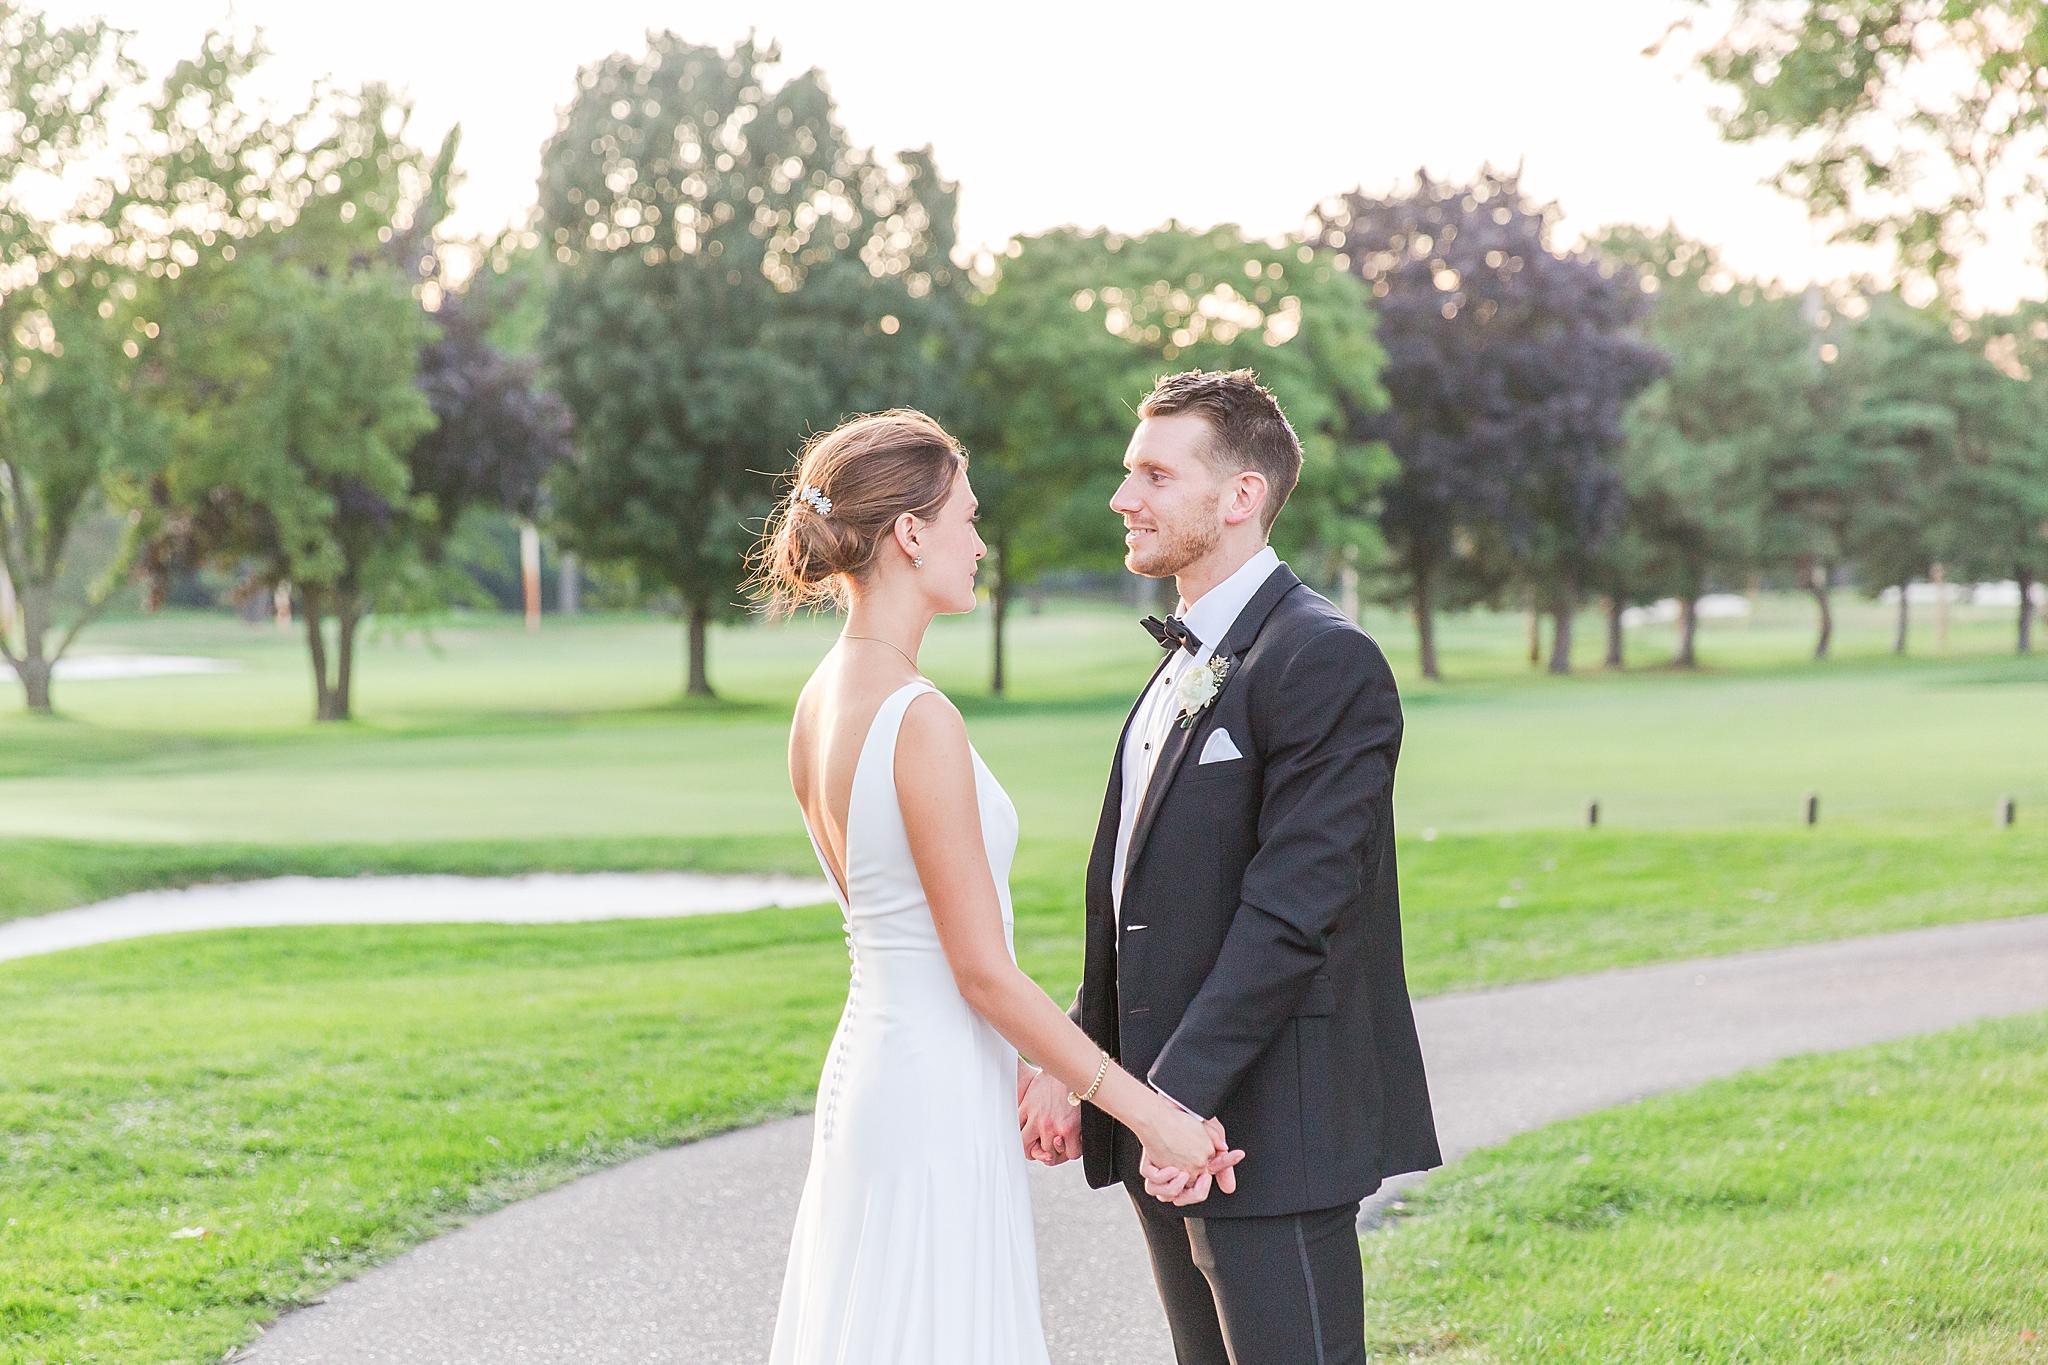 detroit-wedding-photographer-grosse-pointe-academy-chapel-detroit-golf-club-wedding-carly-matt-by-courtney-carolyn-photography_0121.jpg